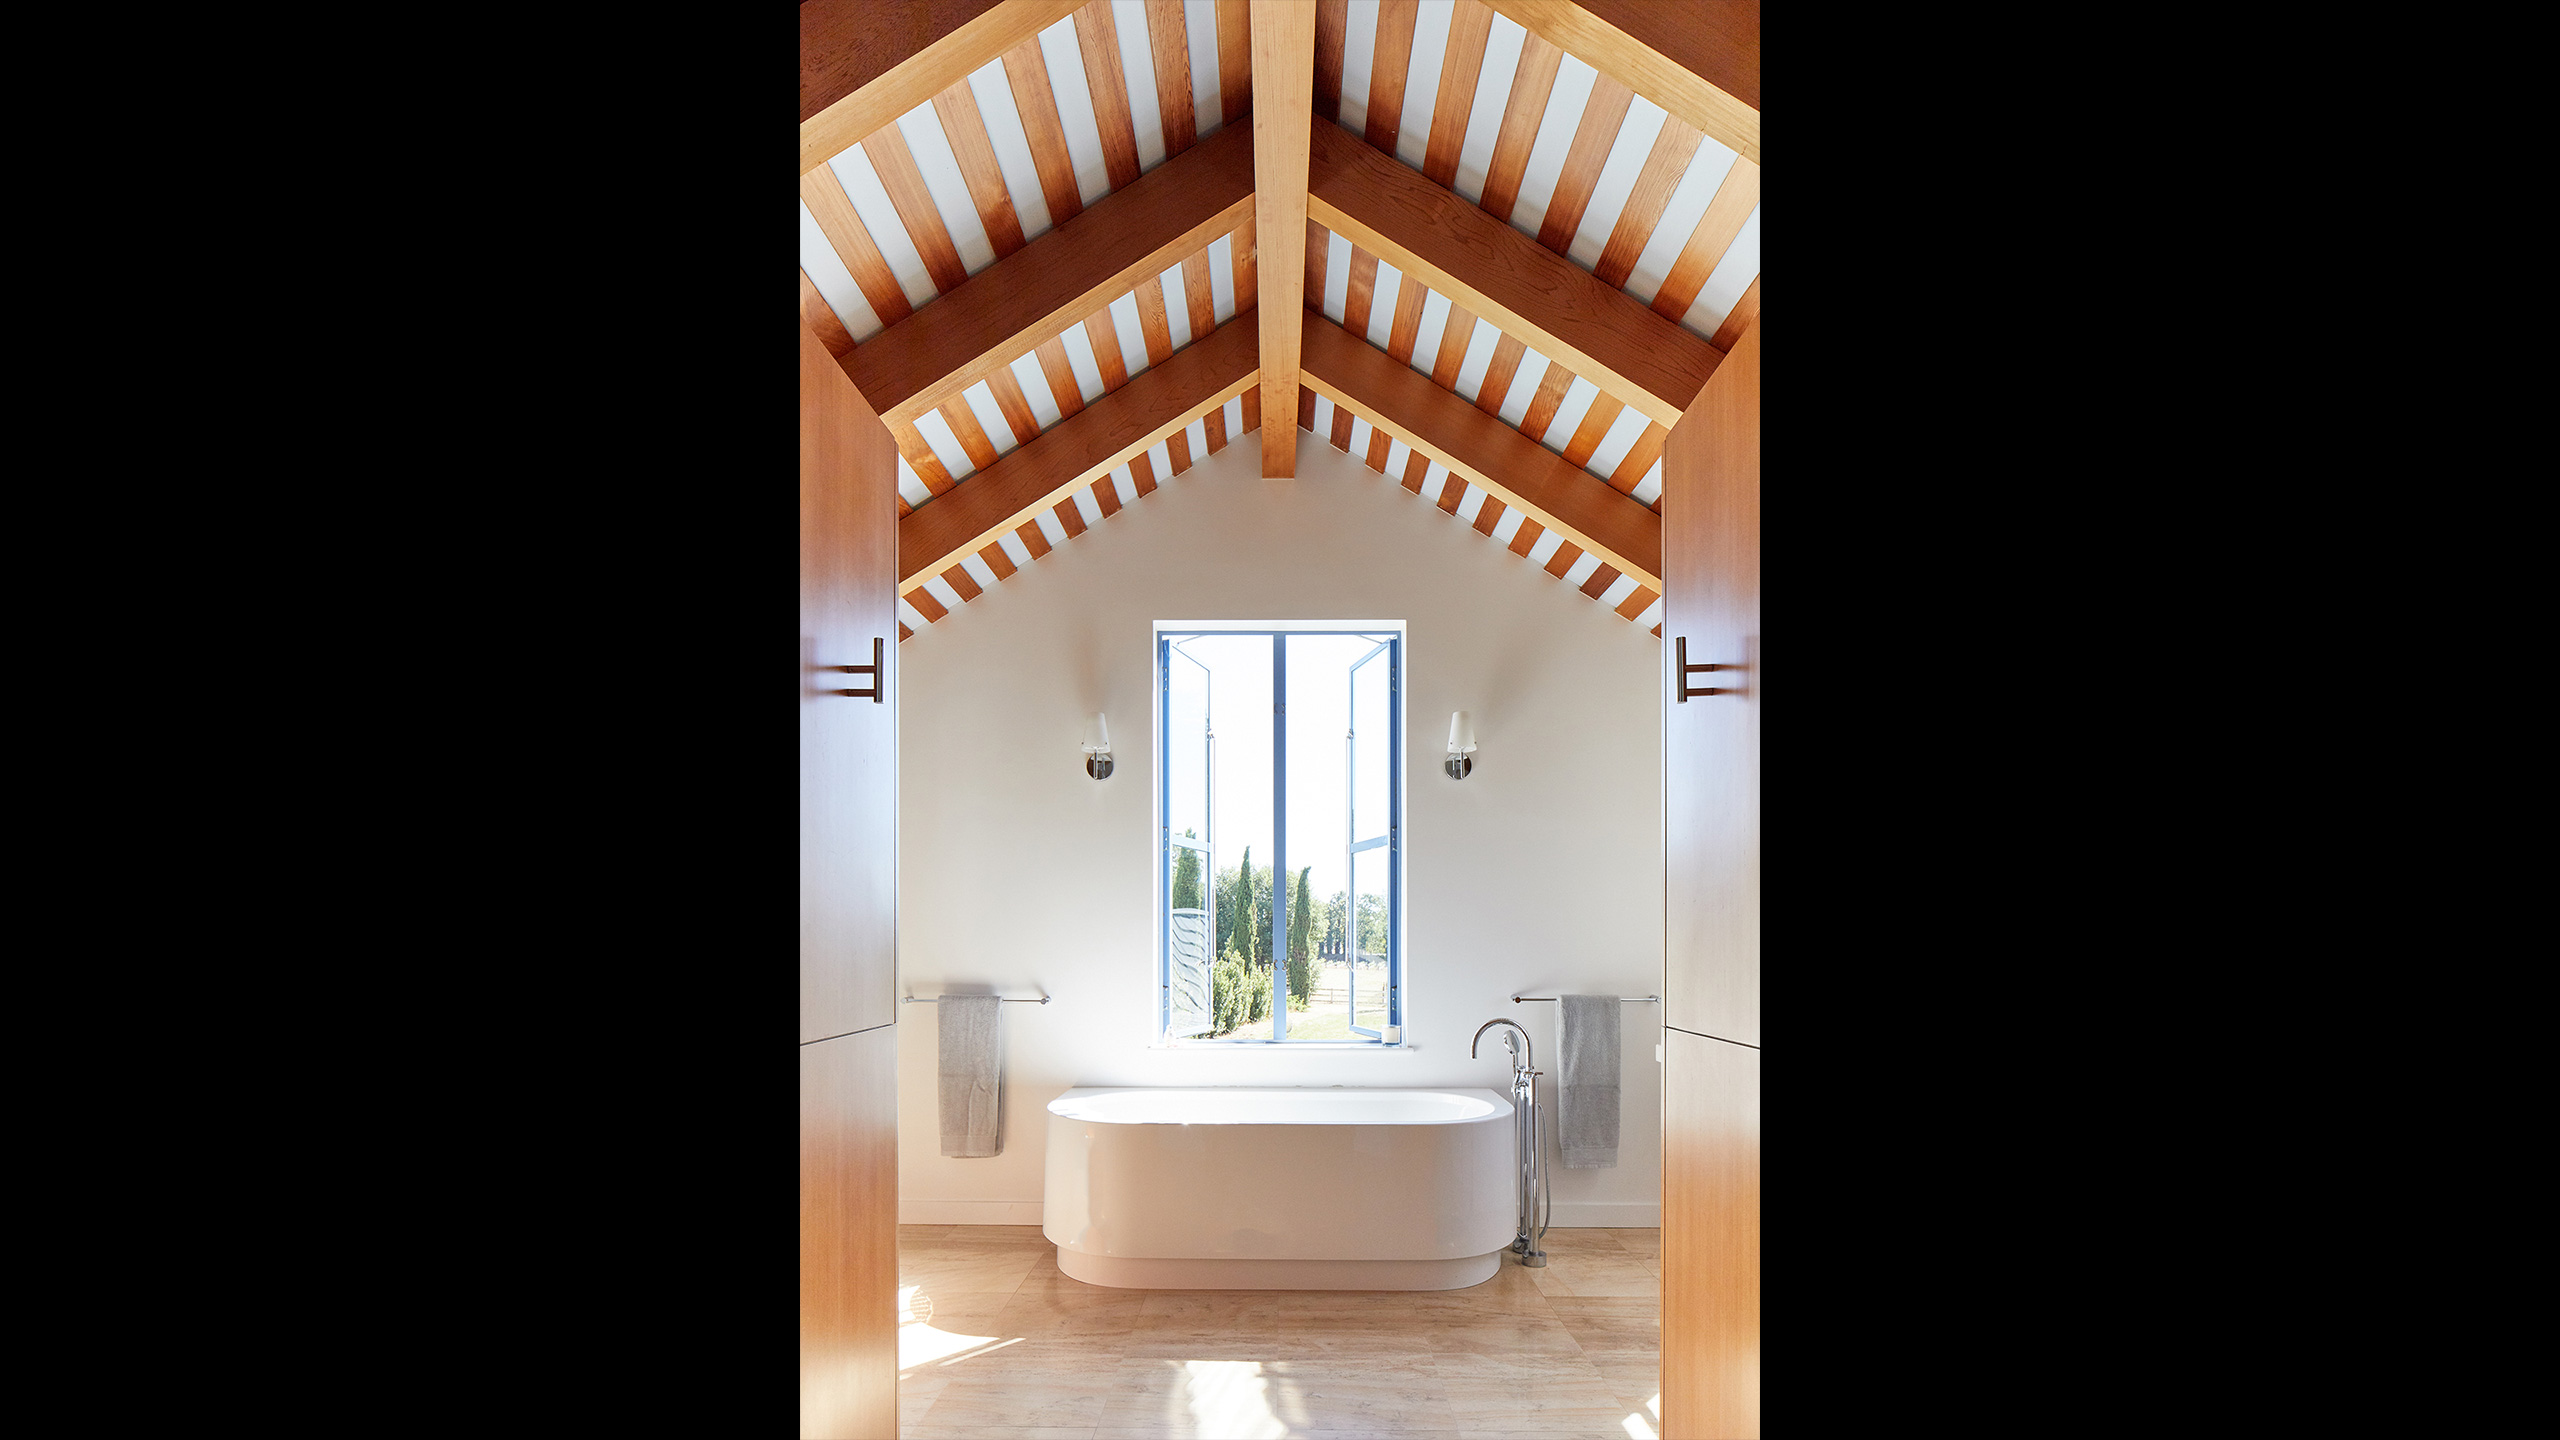 Napa-Farmhouse-bathroom-with-freestanding-tub-and-view